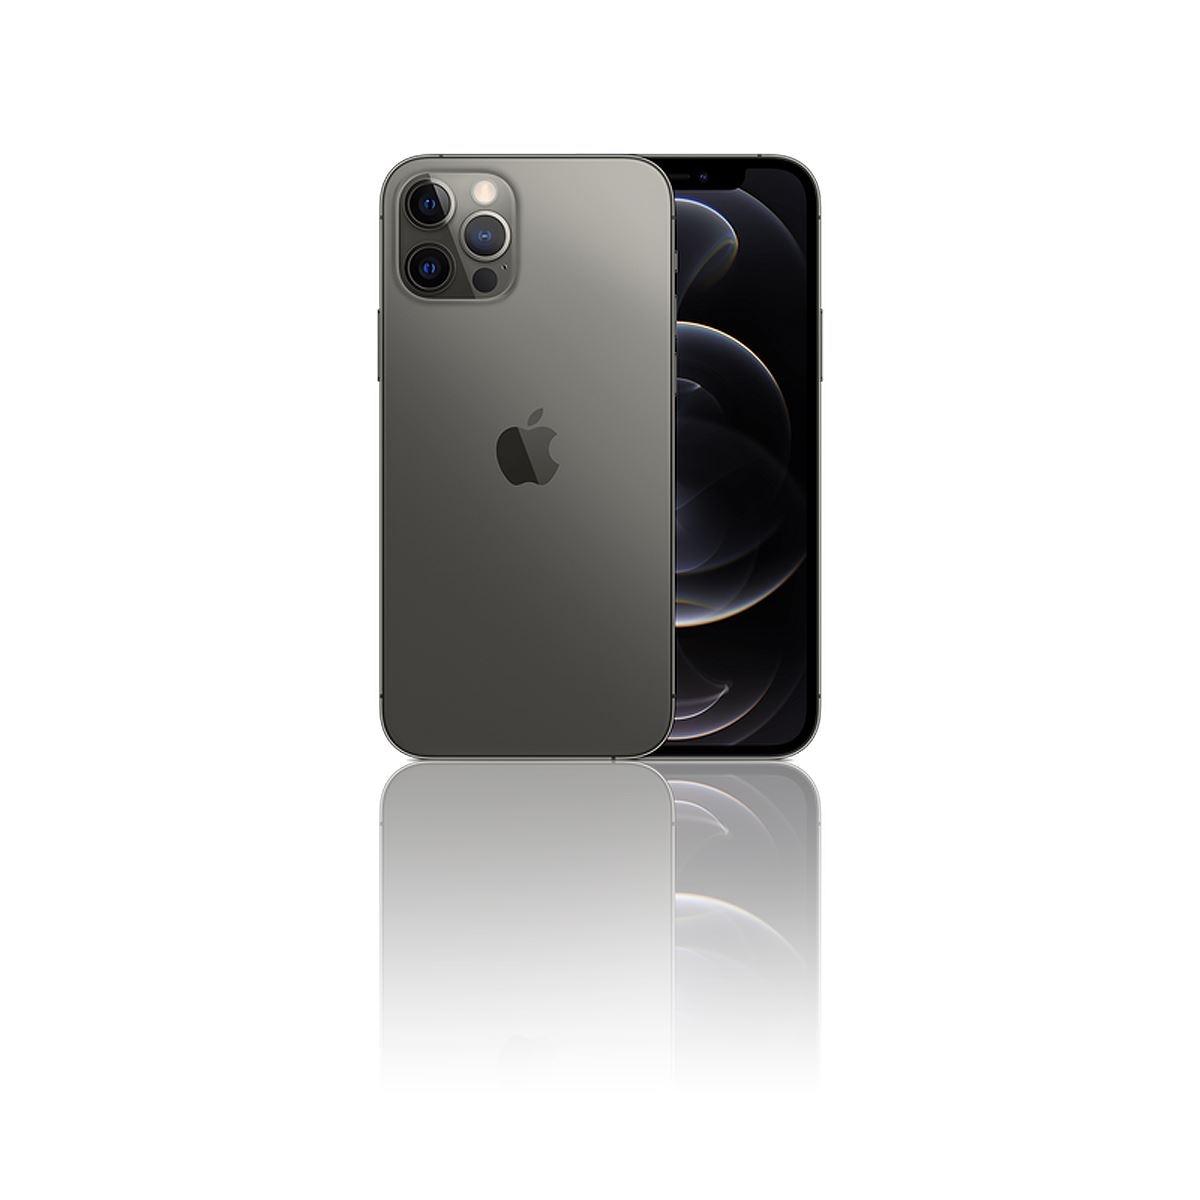 iPhone 12 Pro 128GB Gris R9 Telcel